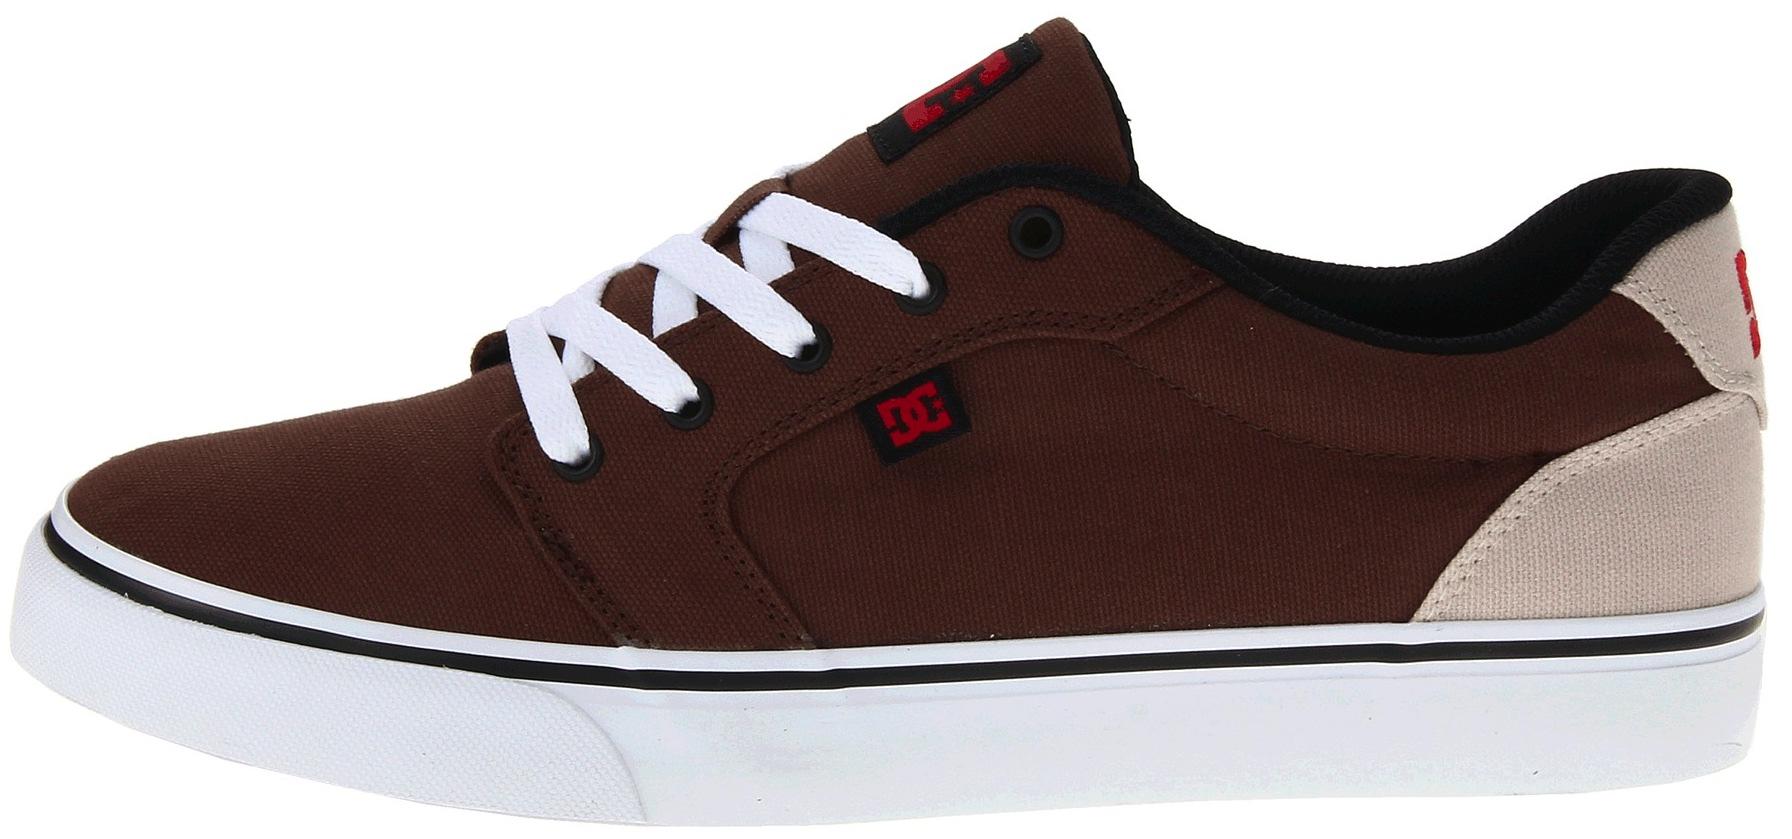 DC Anvil TX canvas Vegan skateboard shoes